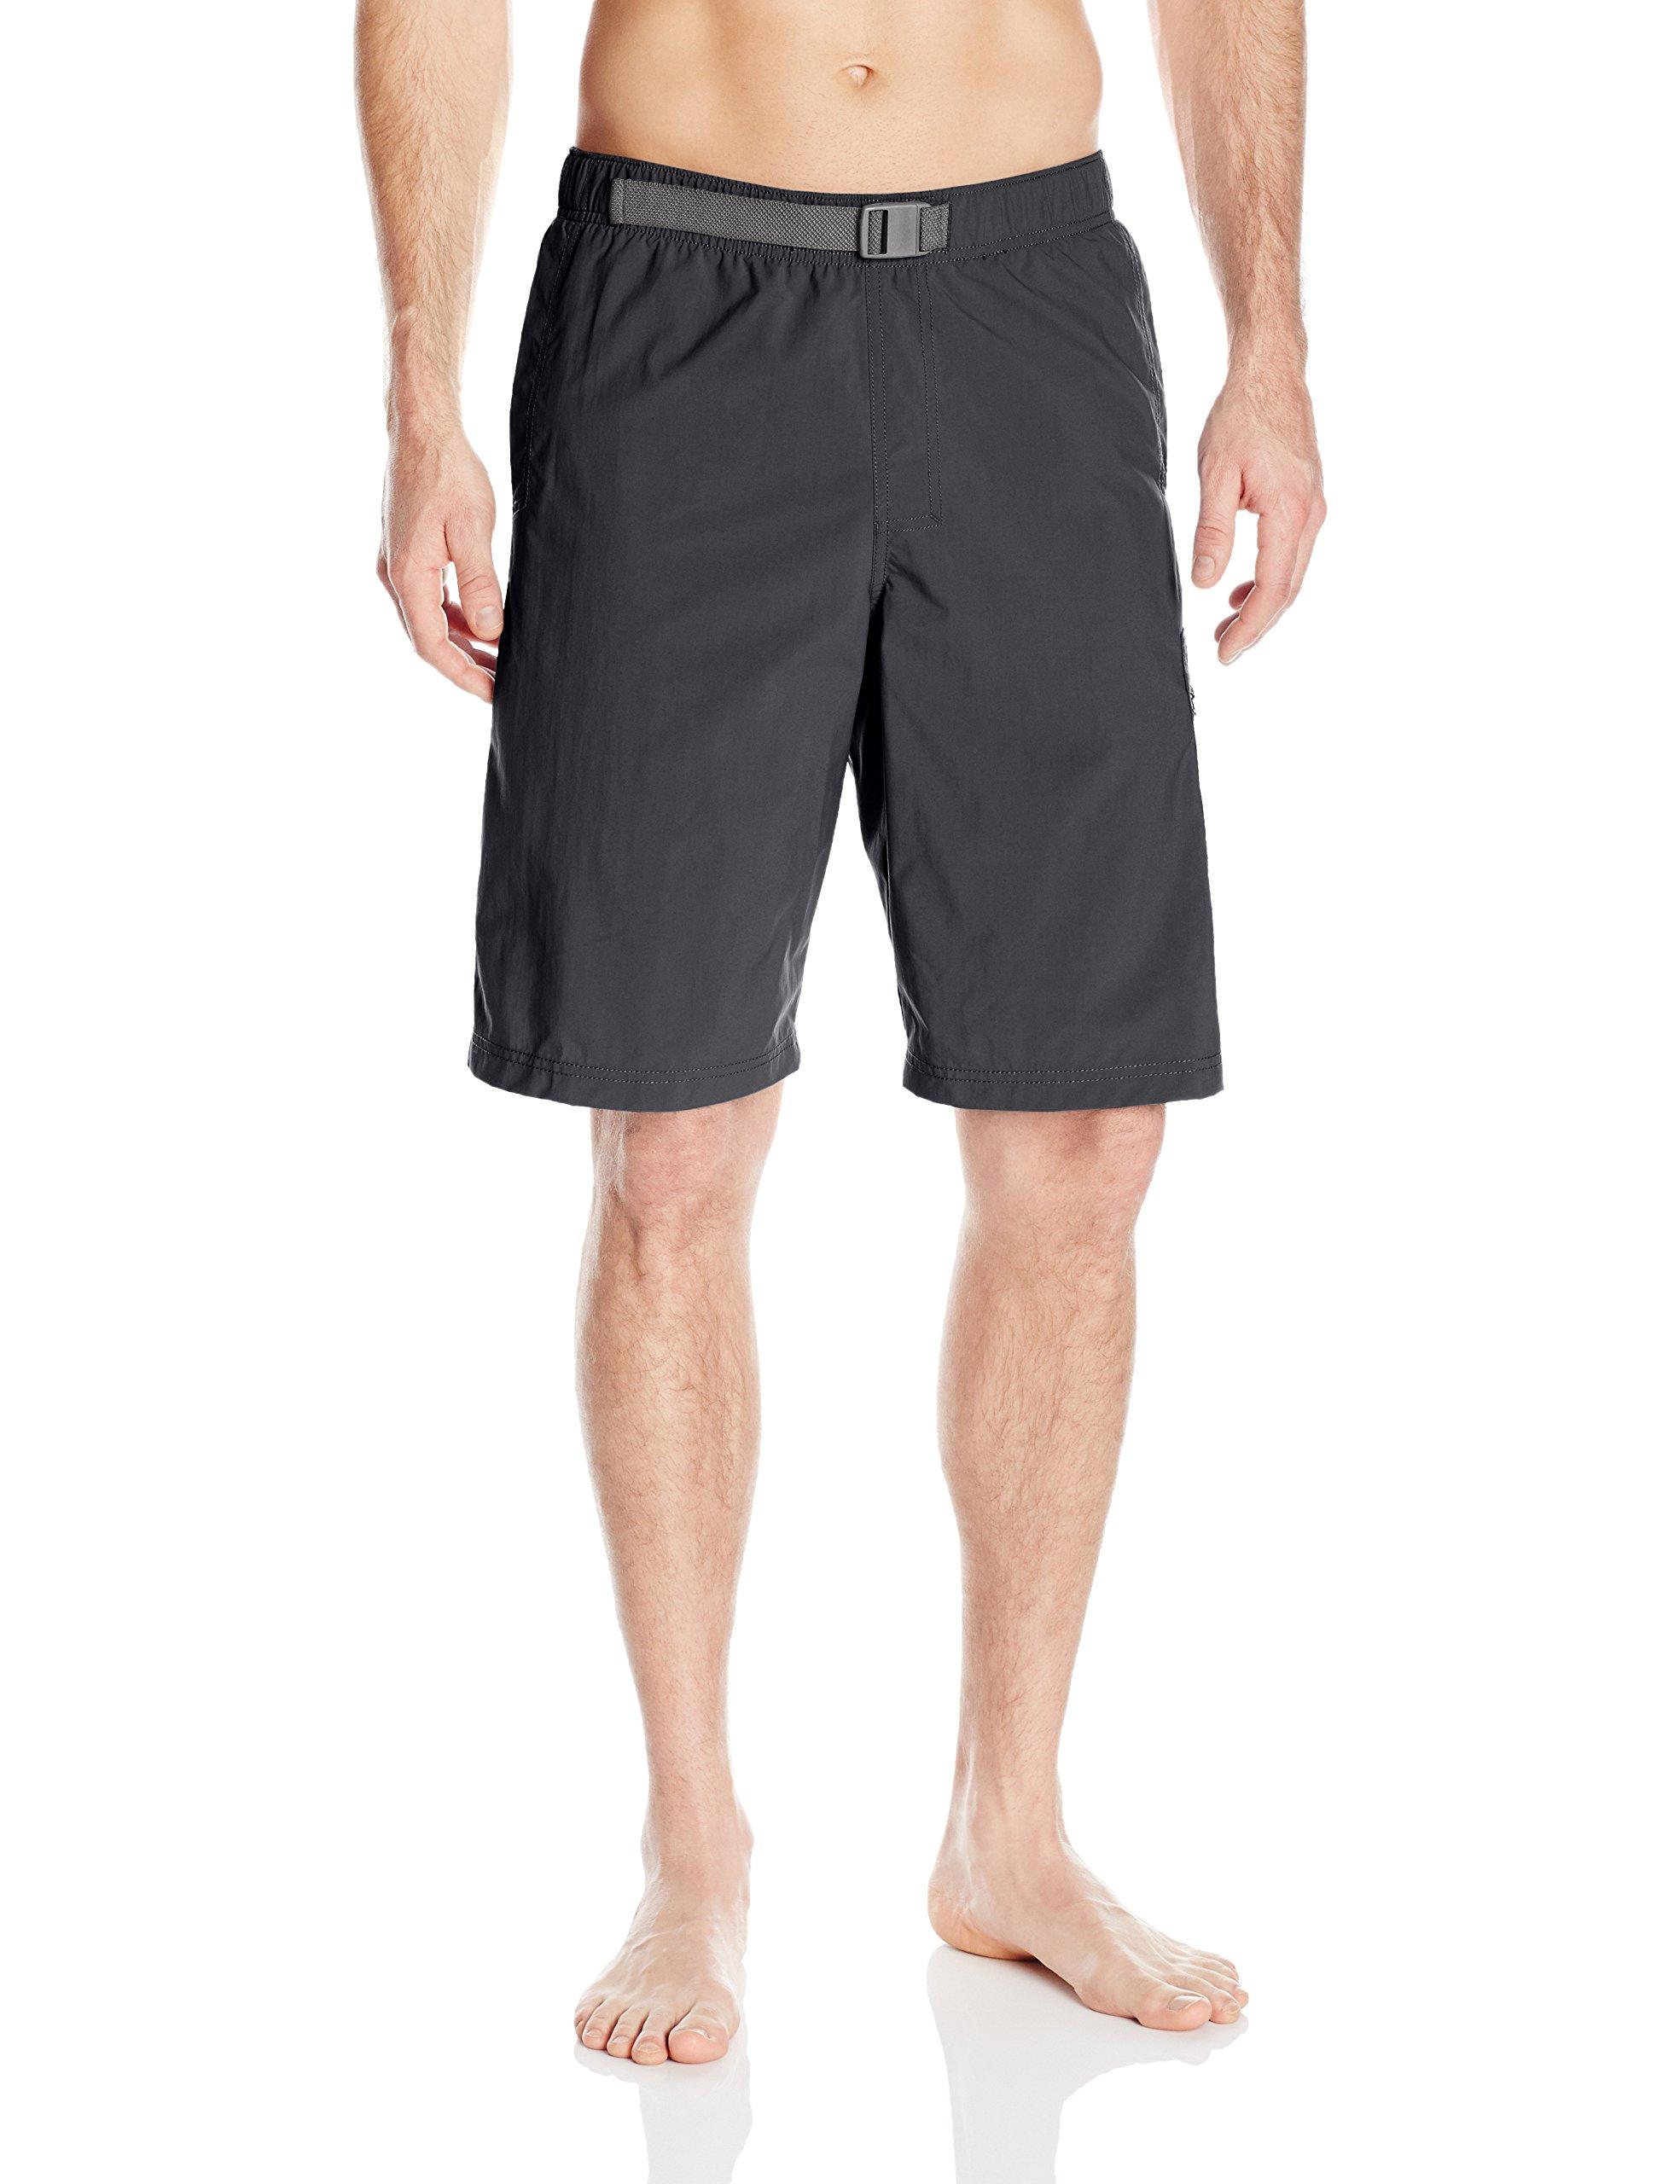 Columbia Men's Palmerston Peak Short, Waterproof, UV Sun Protection, Black, Medium x 11'' Inseam by Columbia